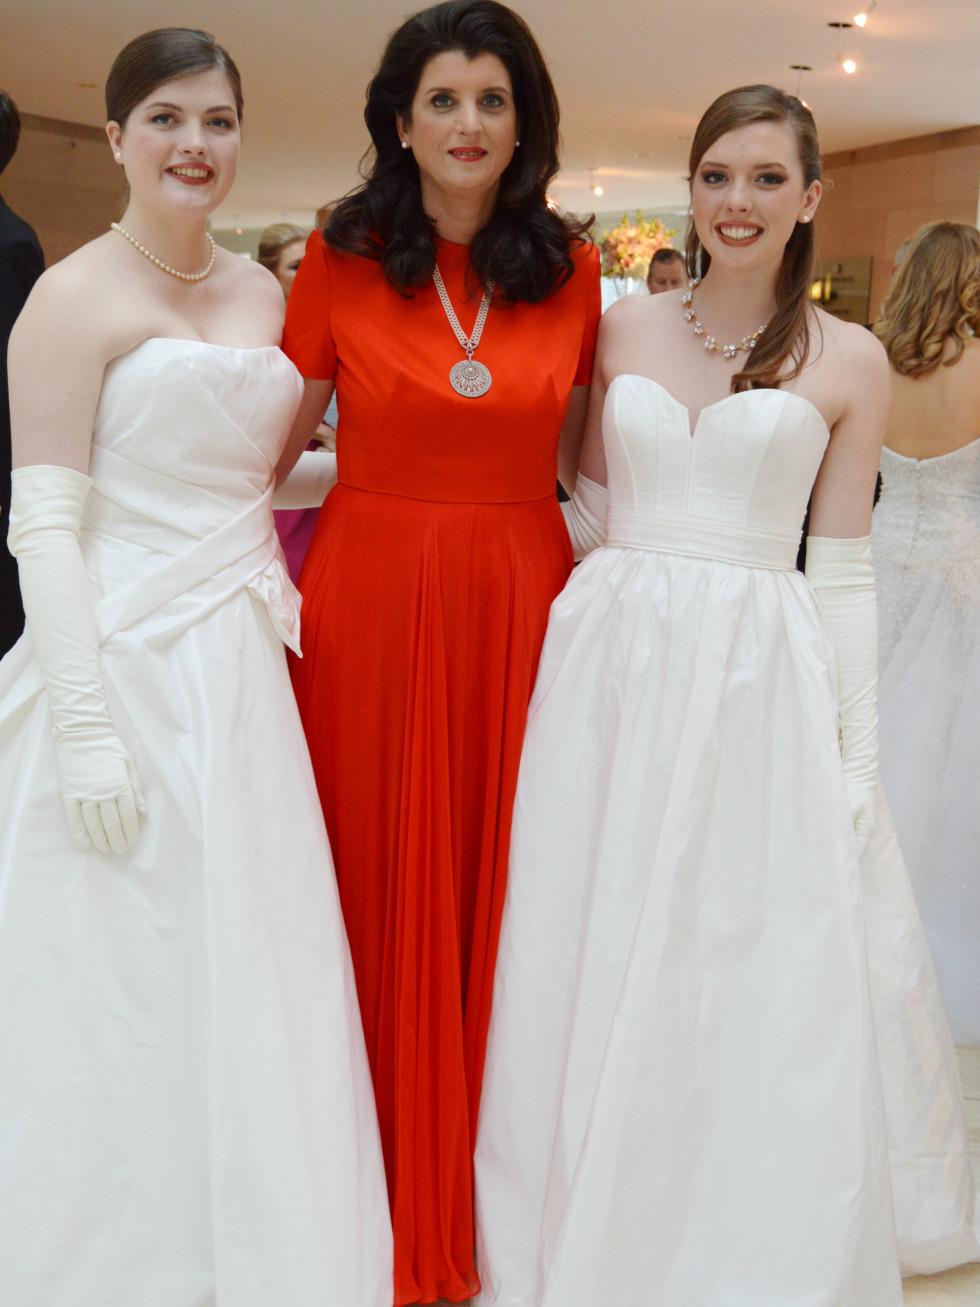 Alexandra, Claire and Carolina Henry